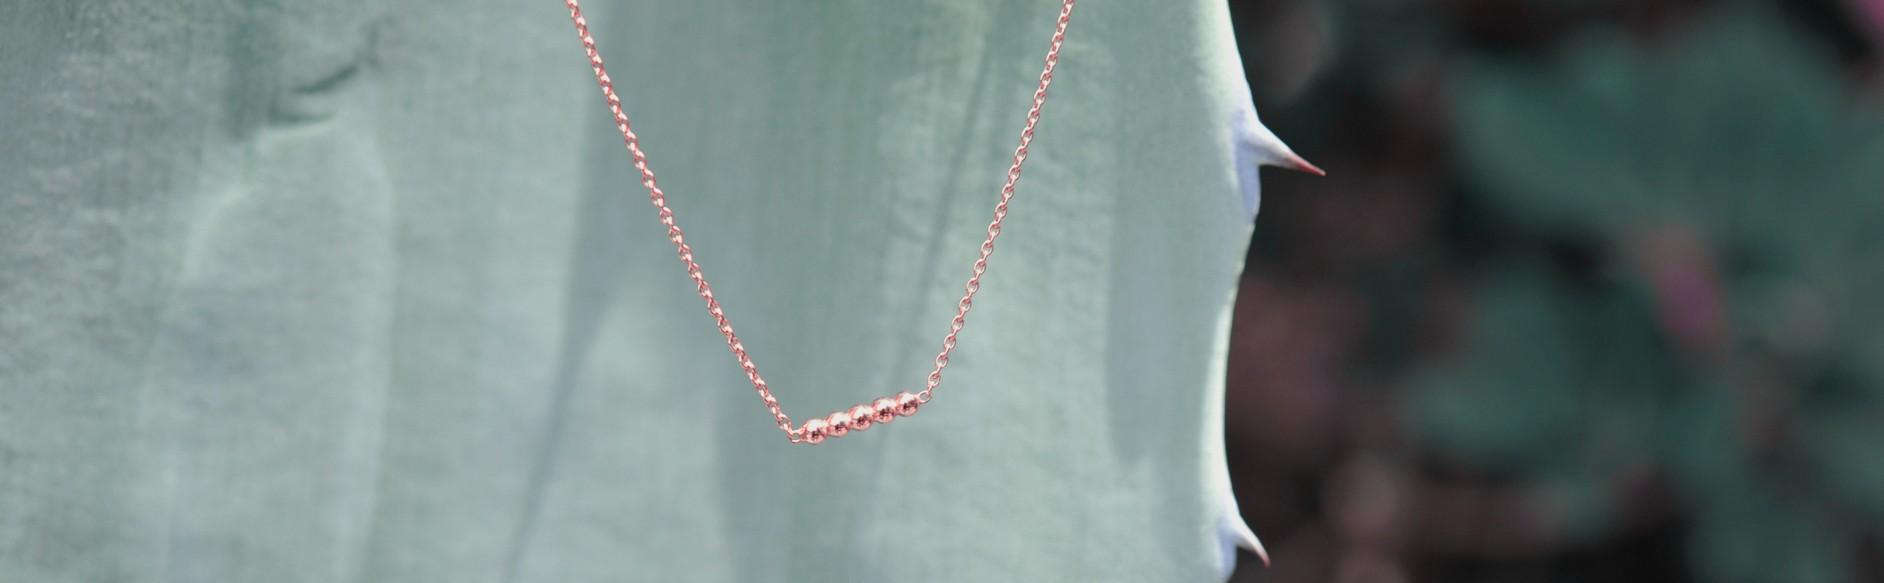 collier eldorado or rose 18 carats